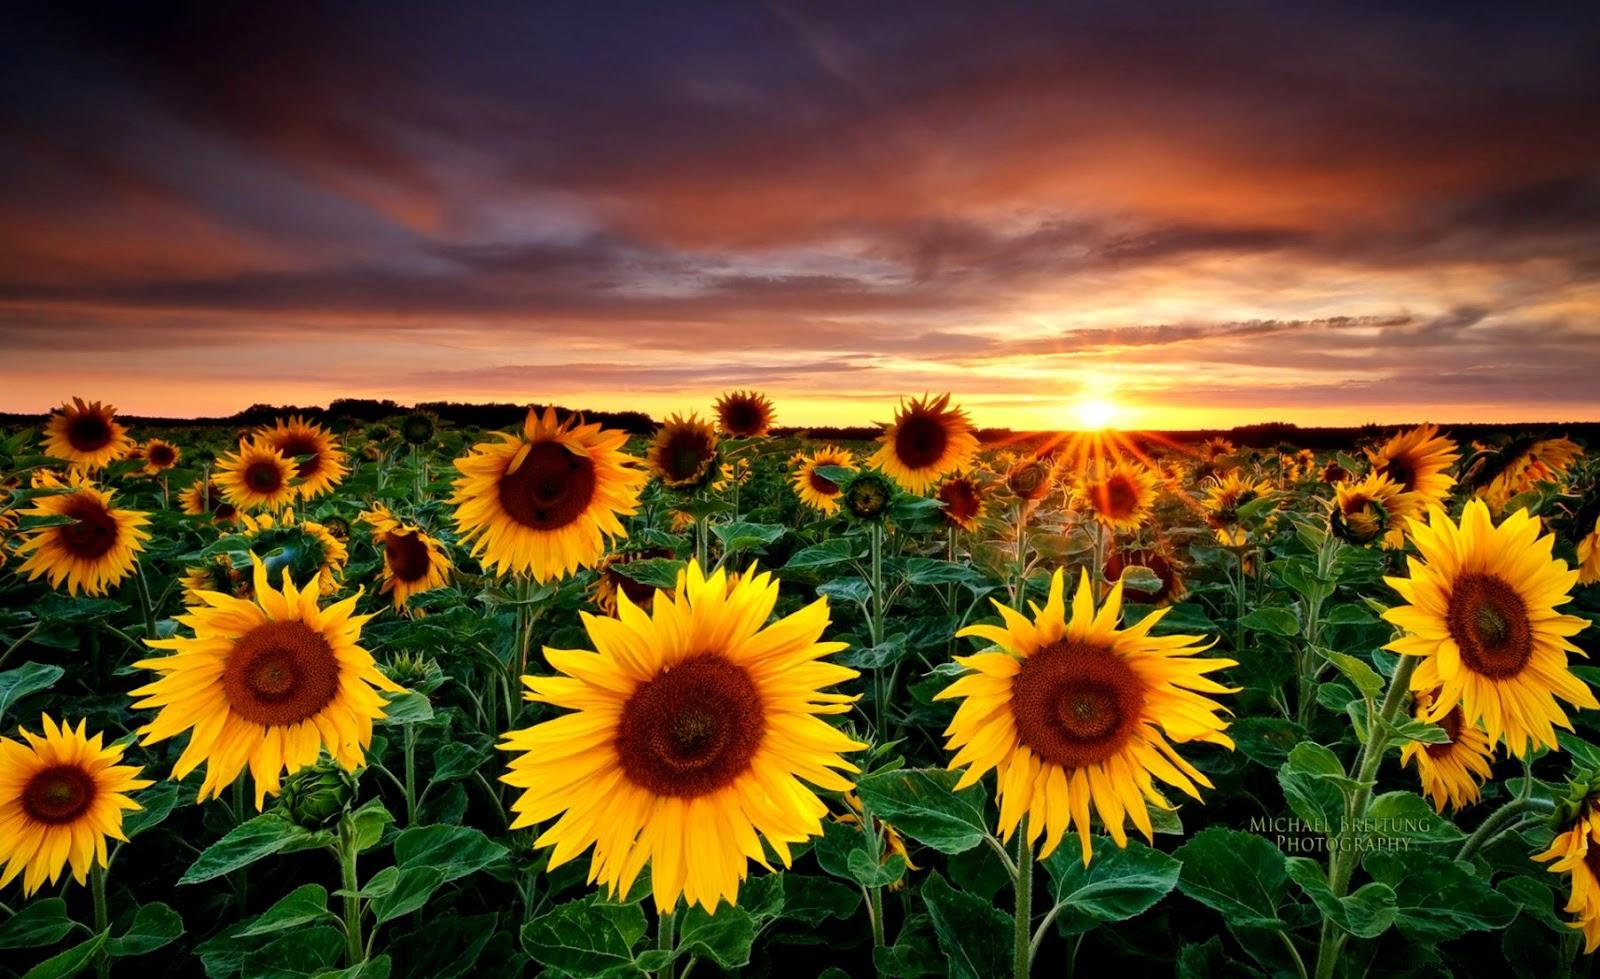 Sunflowers Nature Photography